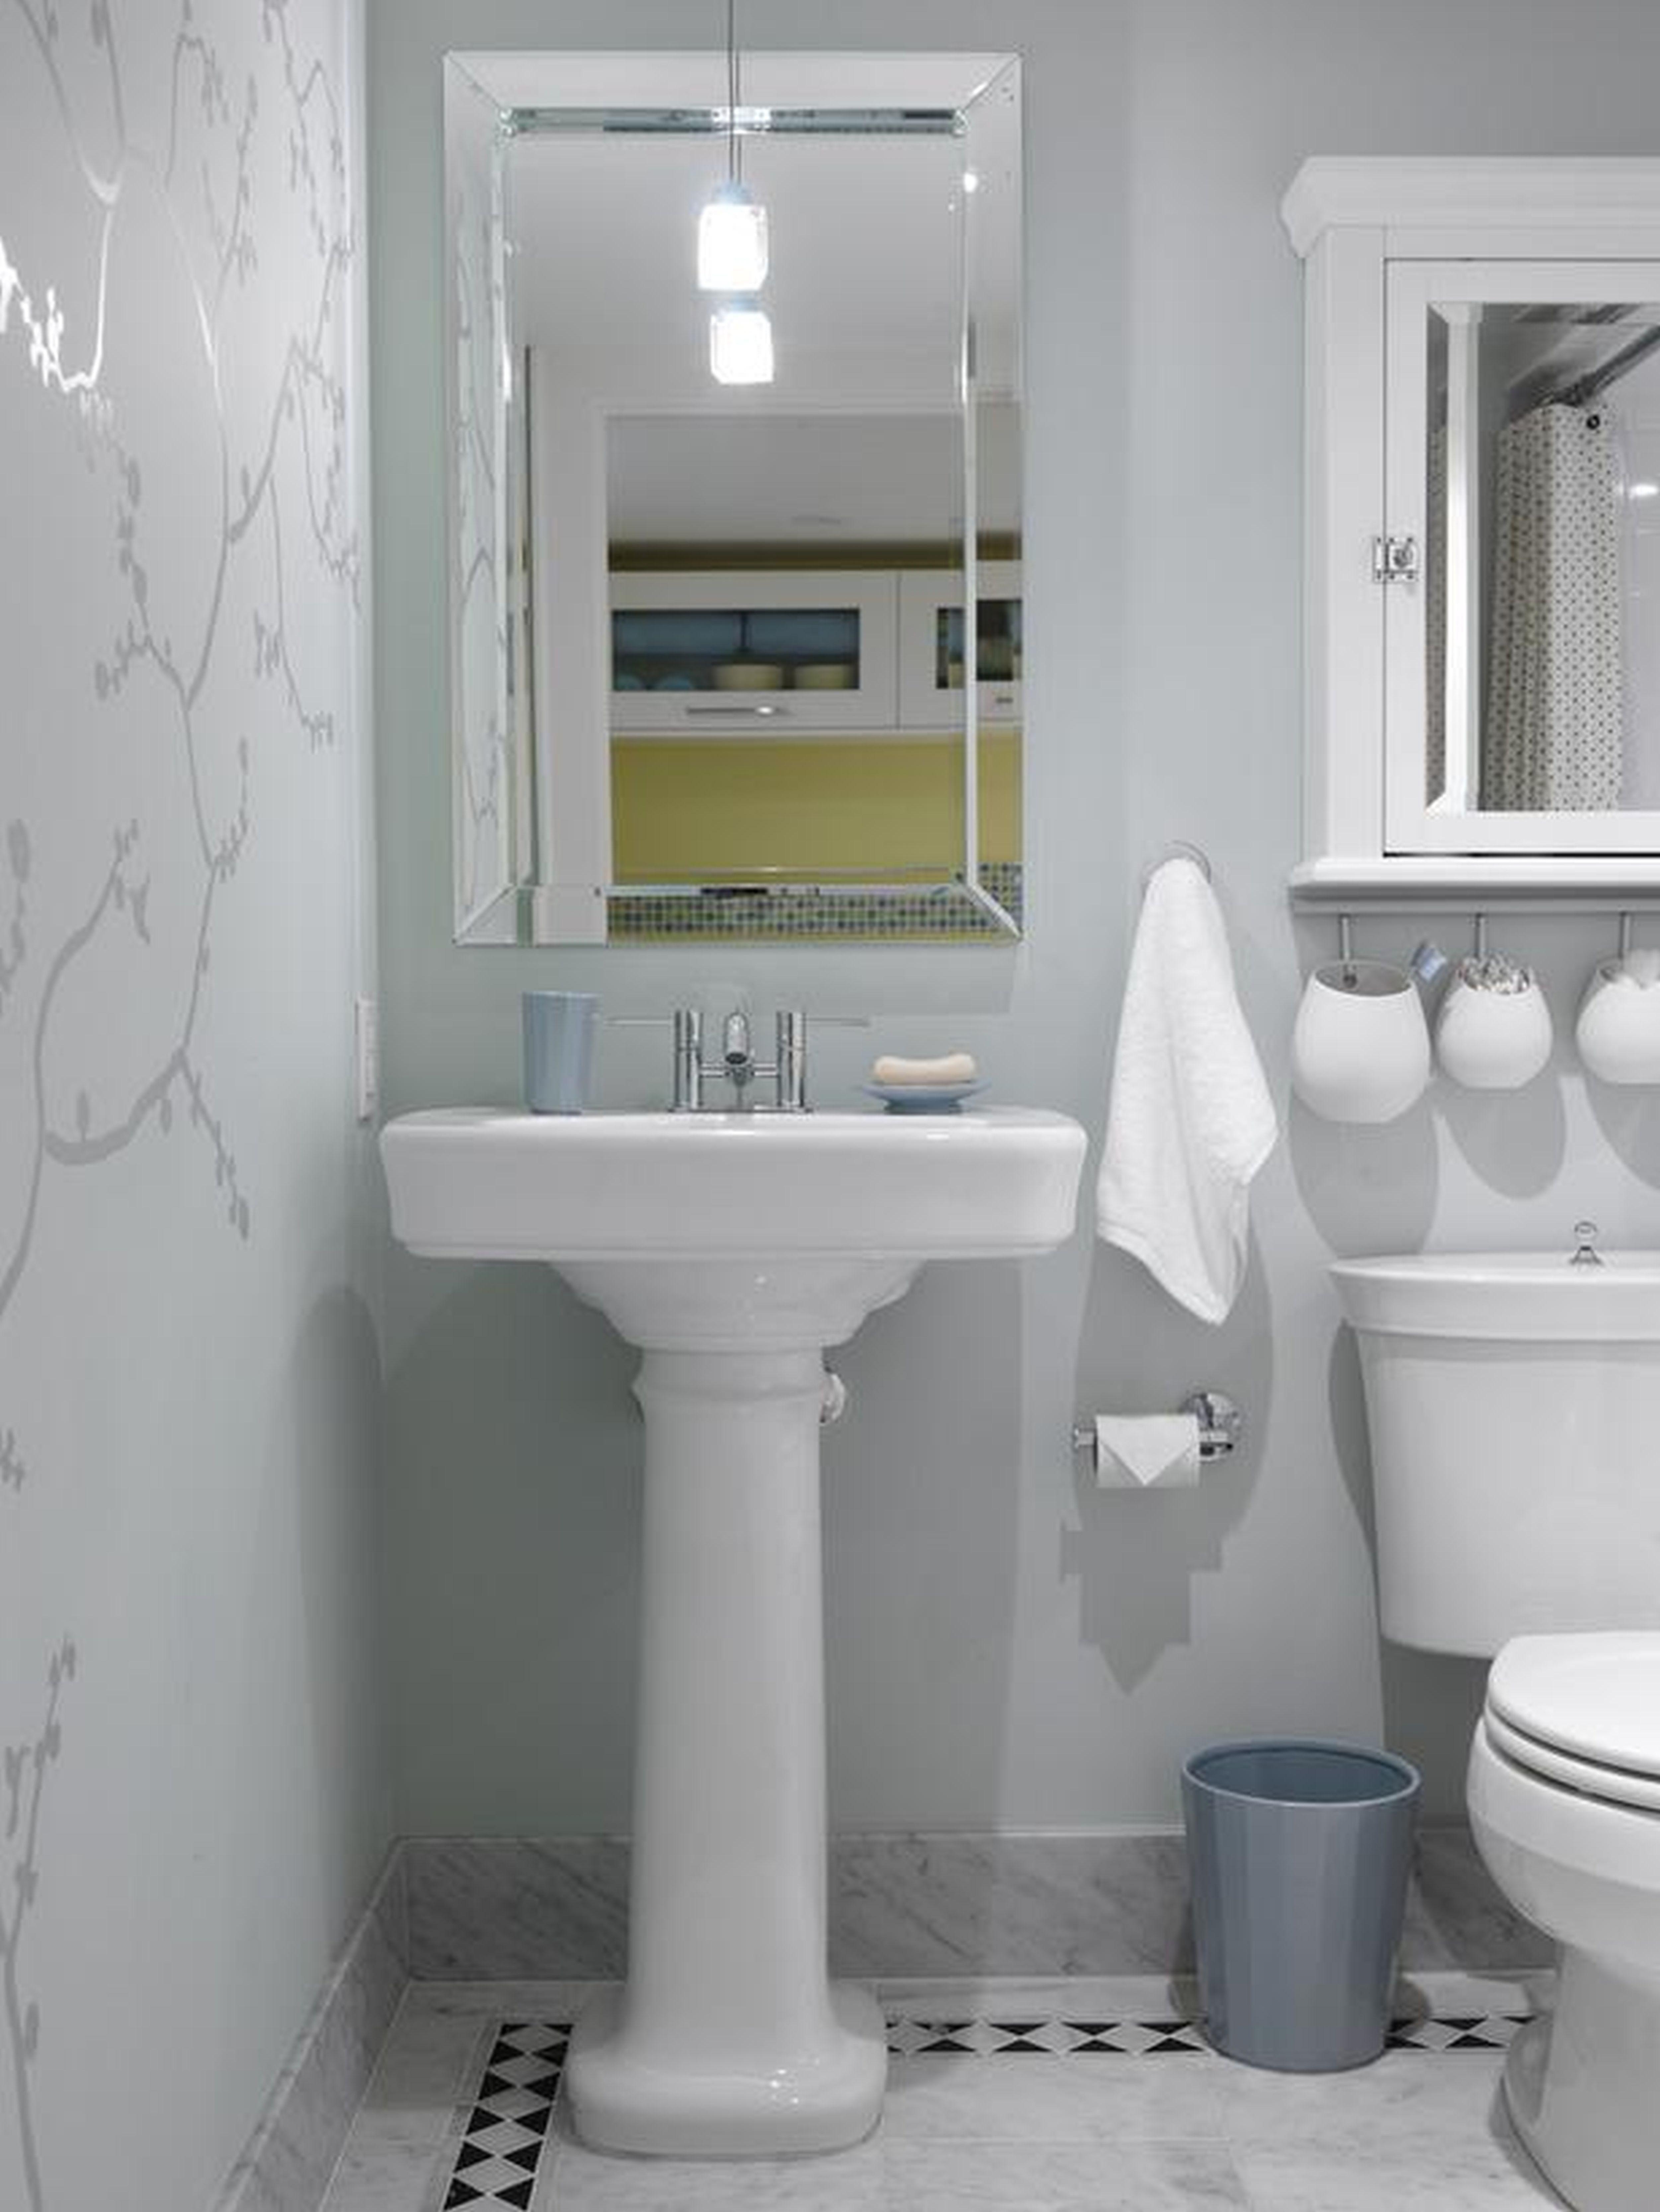 Ordinaire Basement Ideas, Creative Room Ideas : Antique Small Basement Bathroom Ideas  Superb Home Design